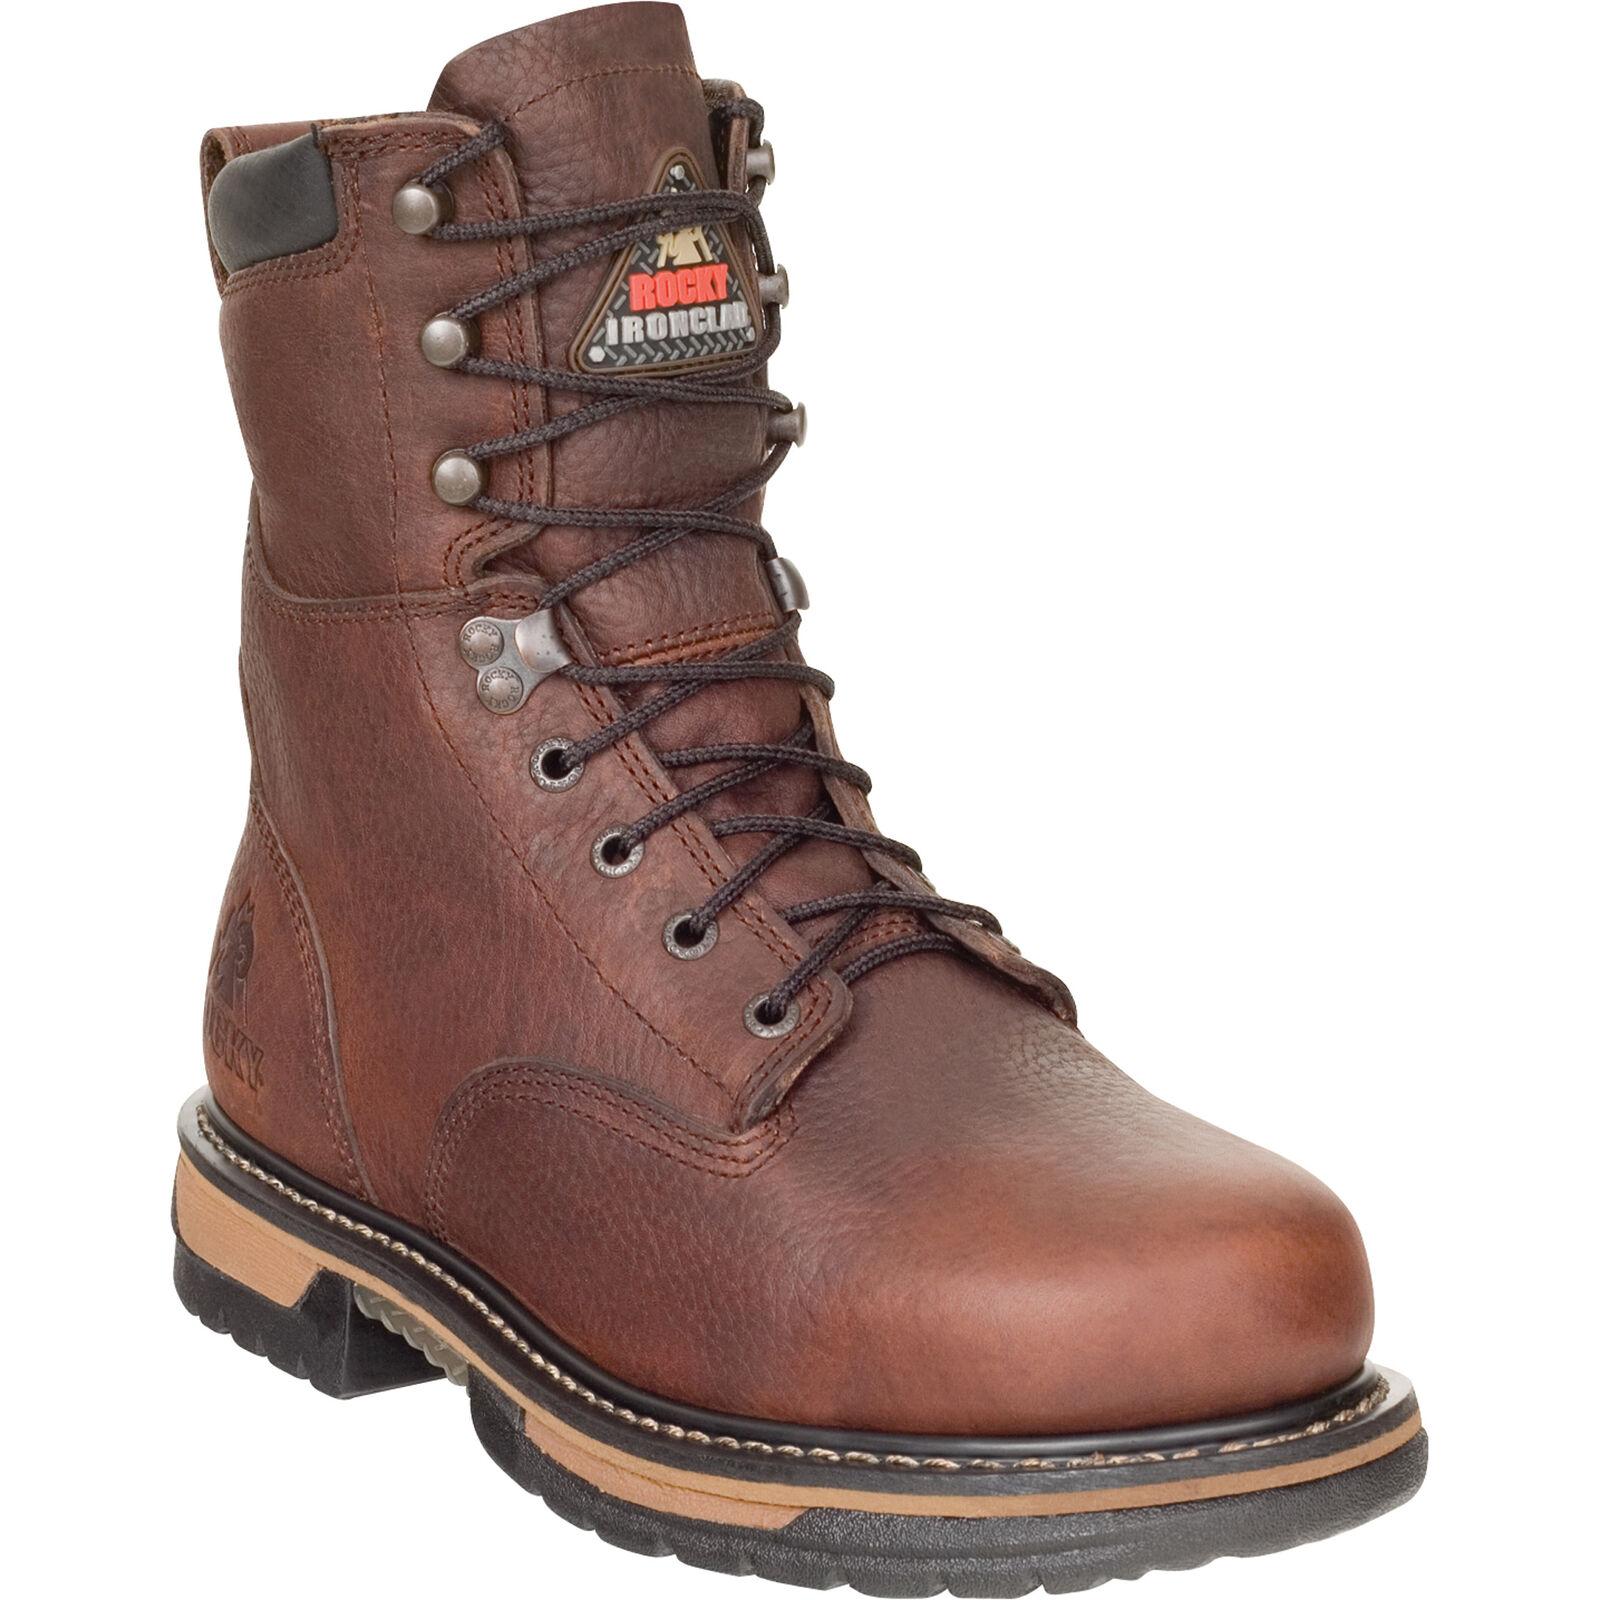 Rocky IronClad 8in. Waterproof Work Boot - Brown, Size 10 1/2 Wide, Model